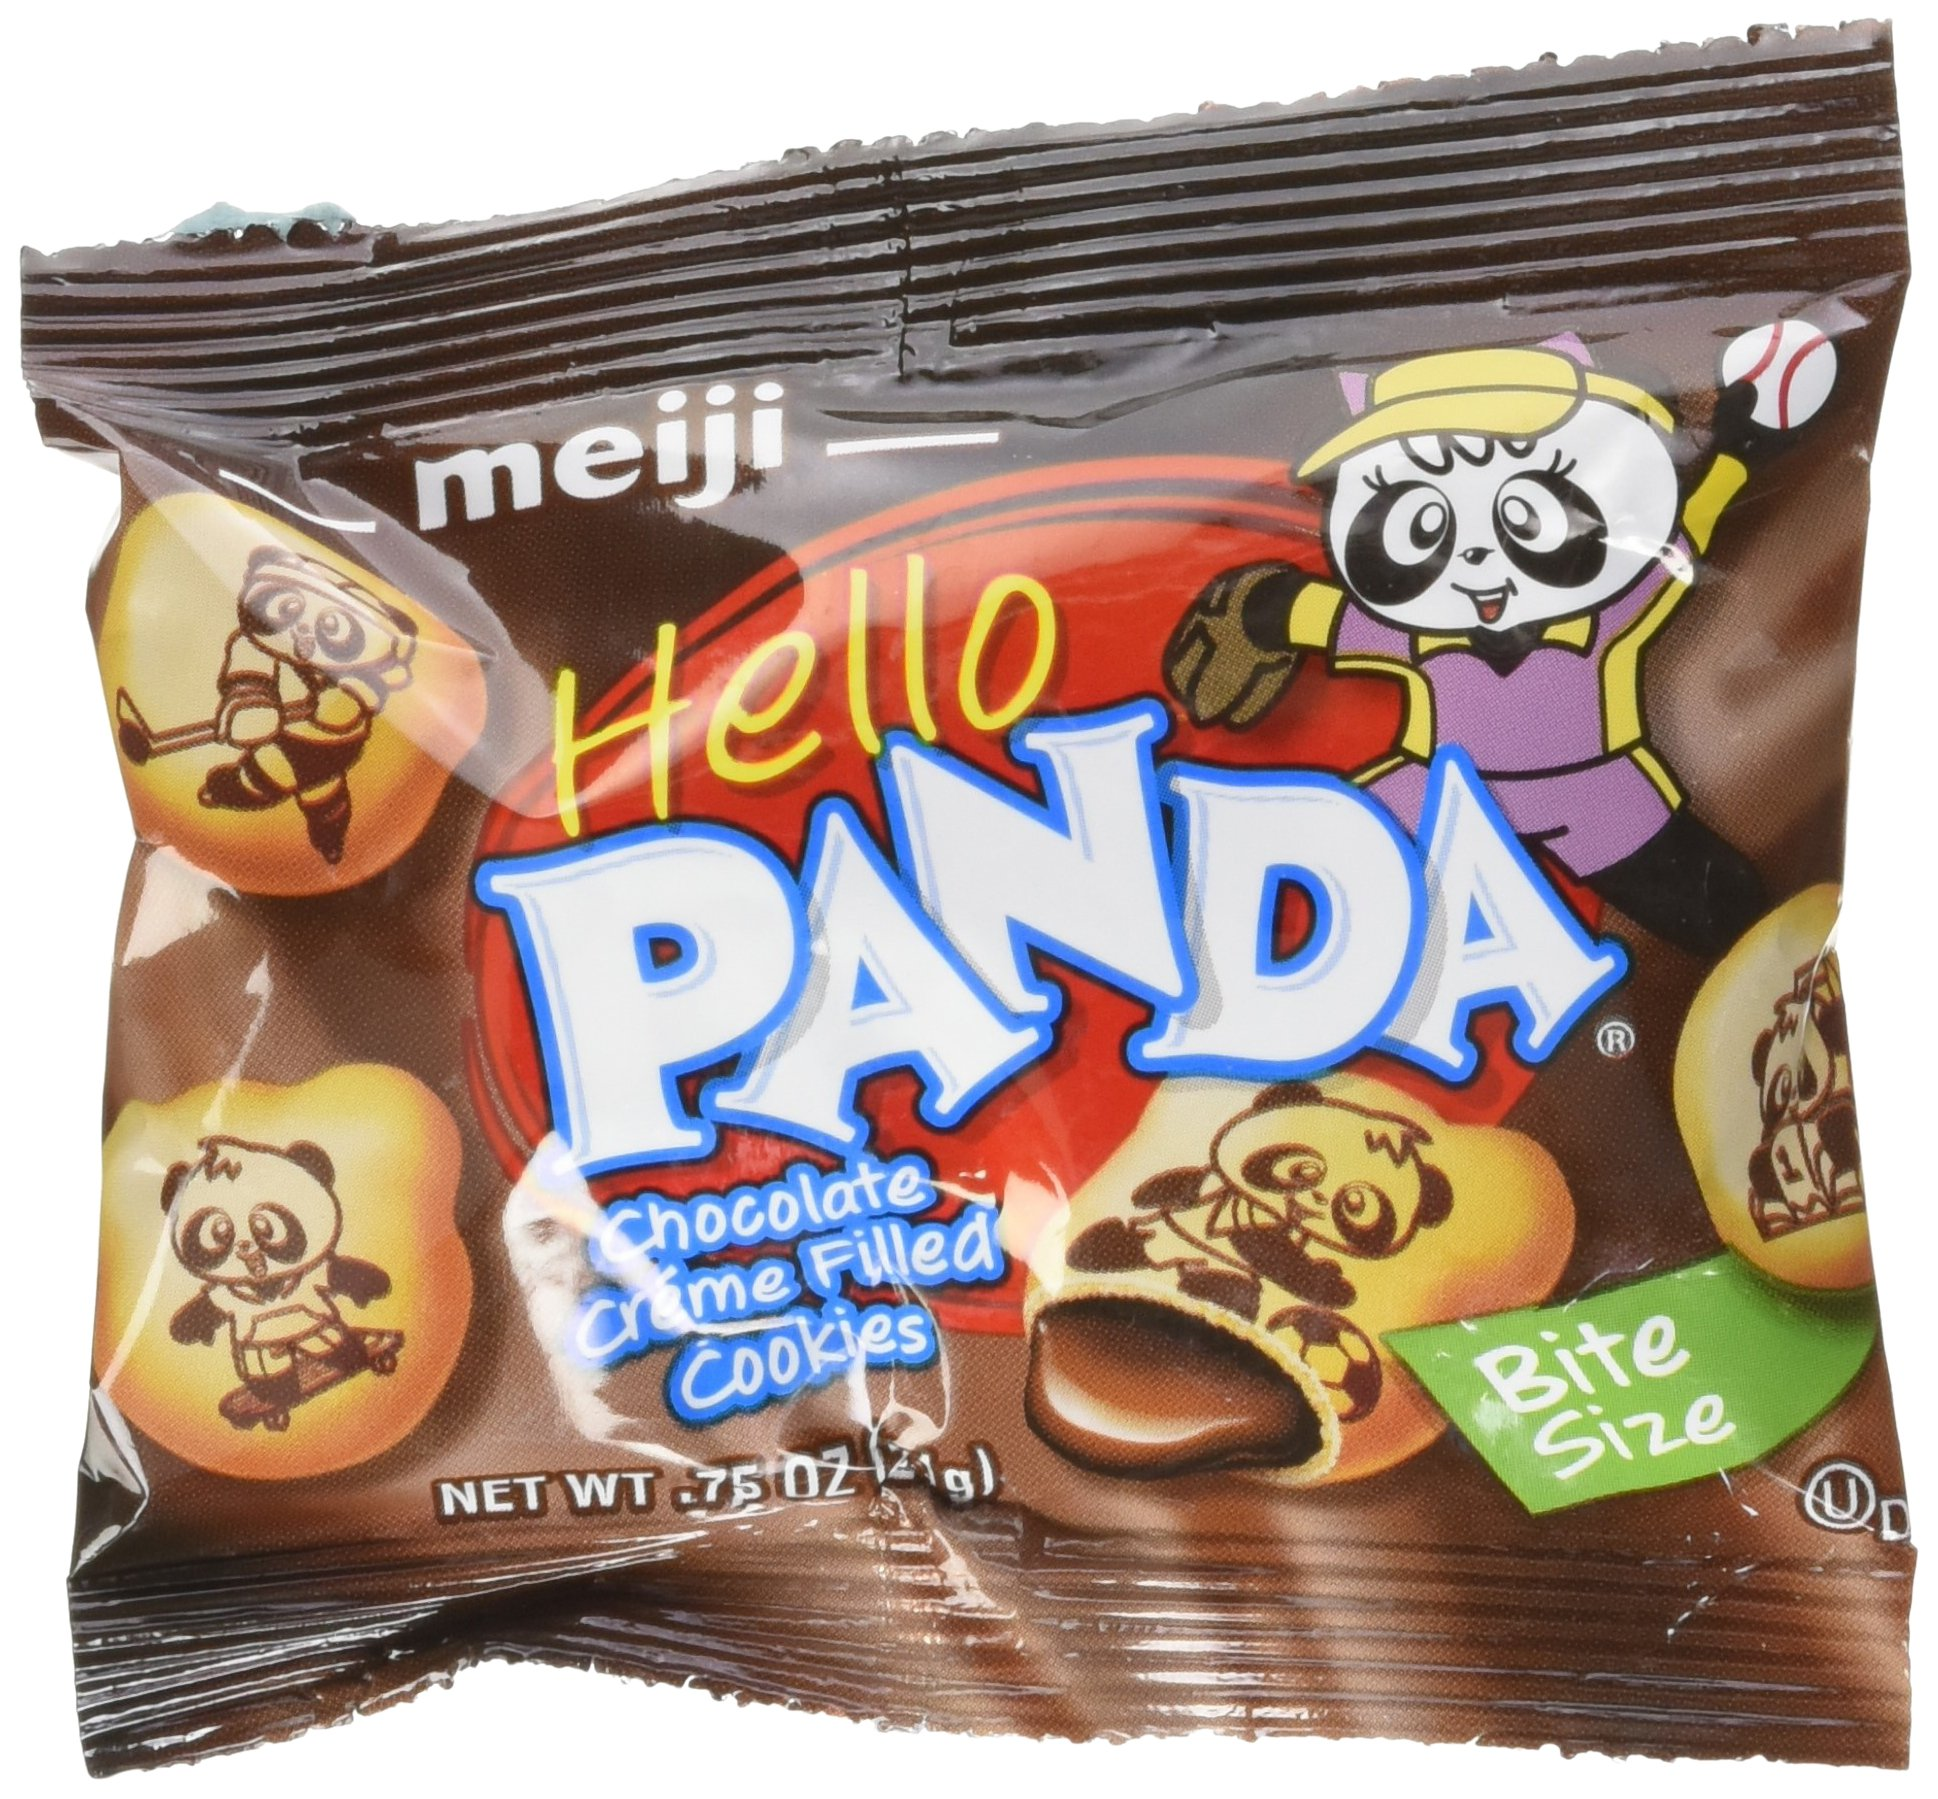 Meiji Hello Panda Chocolate Creme Filled Cookies Jumbo Box - 32 Bags (32 - .75 Oz Bags = 24 Oz) by Meiji